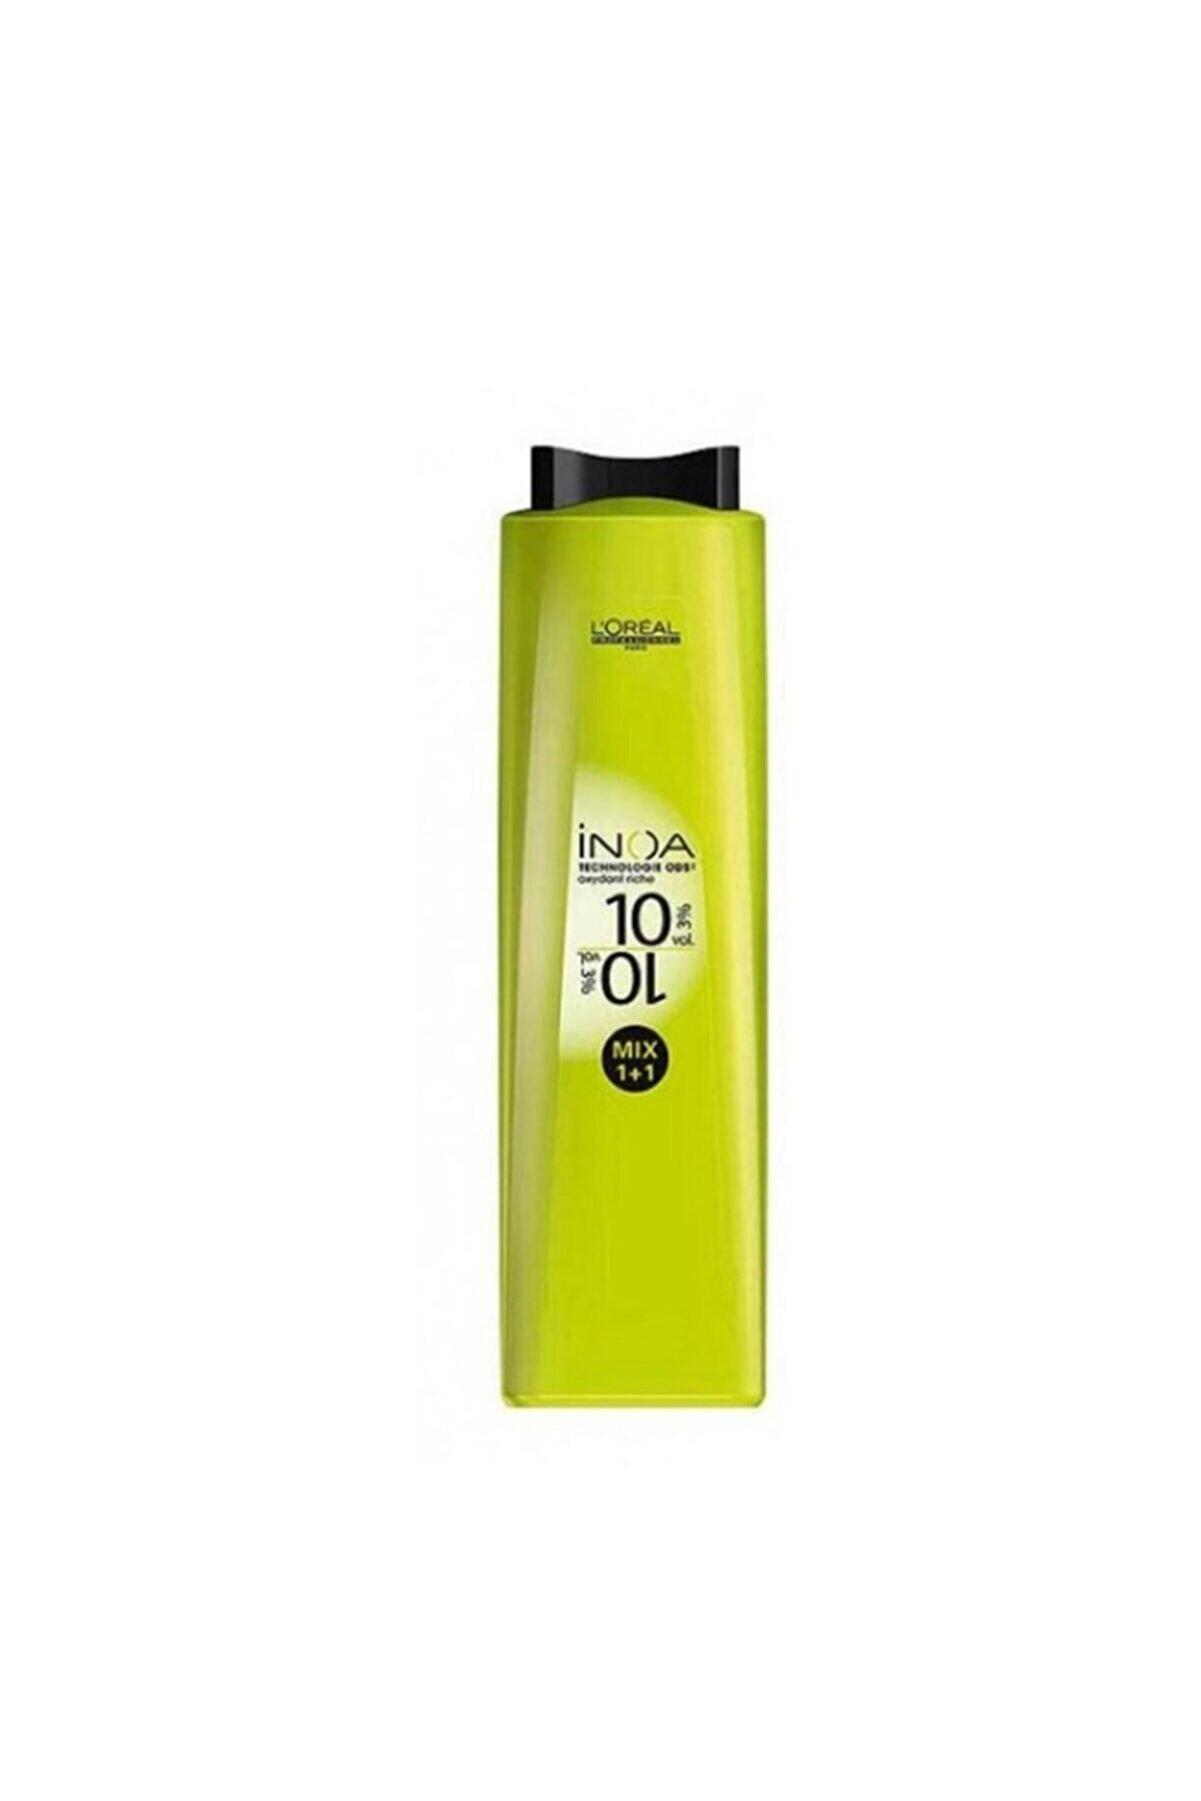 İNOA Inoa Oksidan %3 10 Vol.1 Lt.